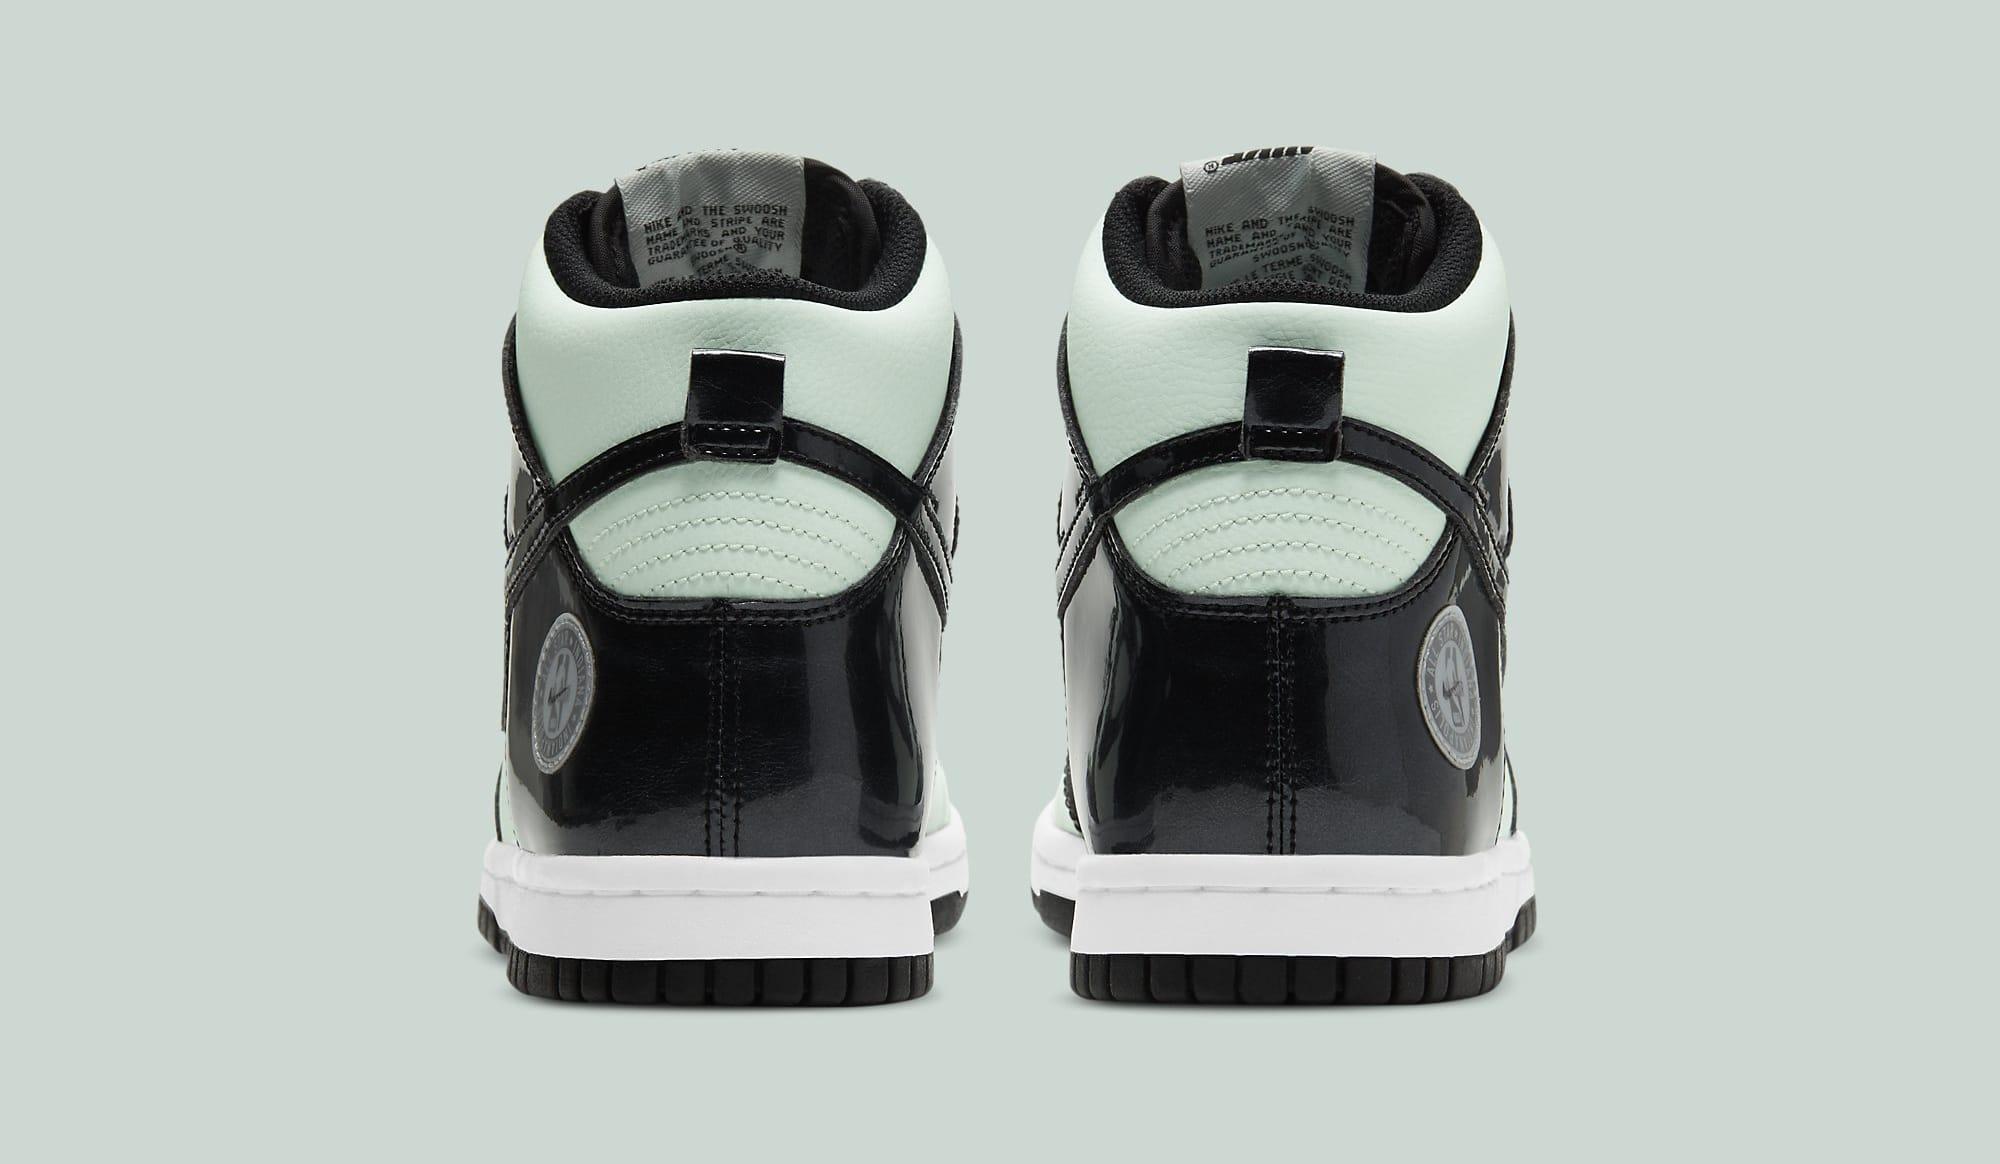 Nike Dunk High DD1846-300 'NBA All-Star' Heel